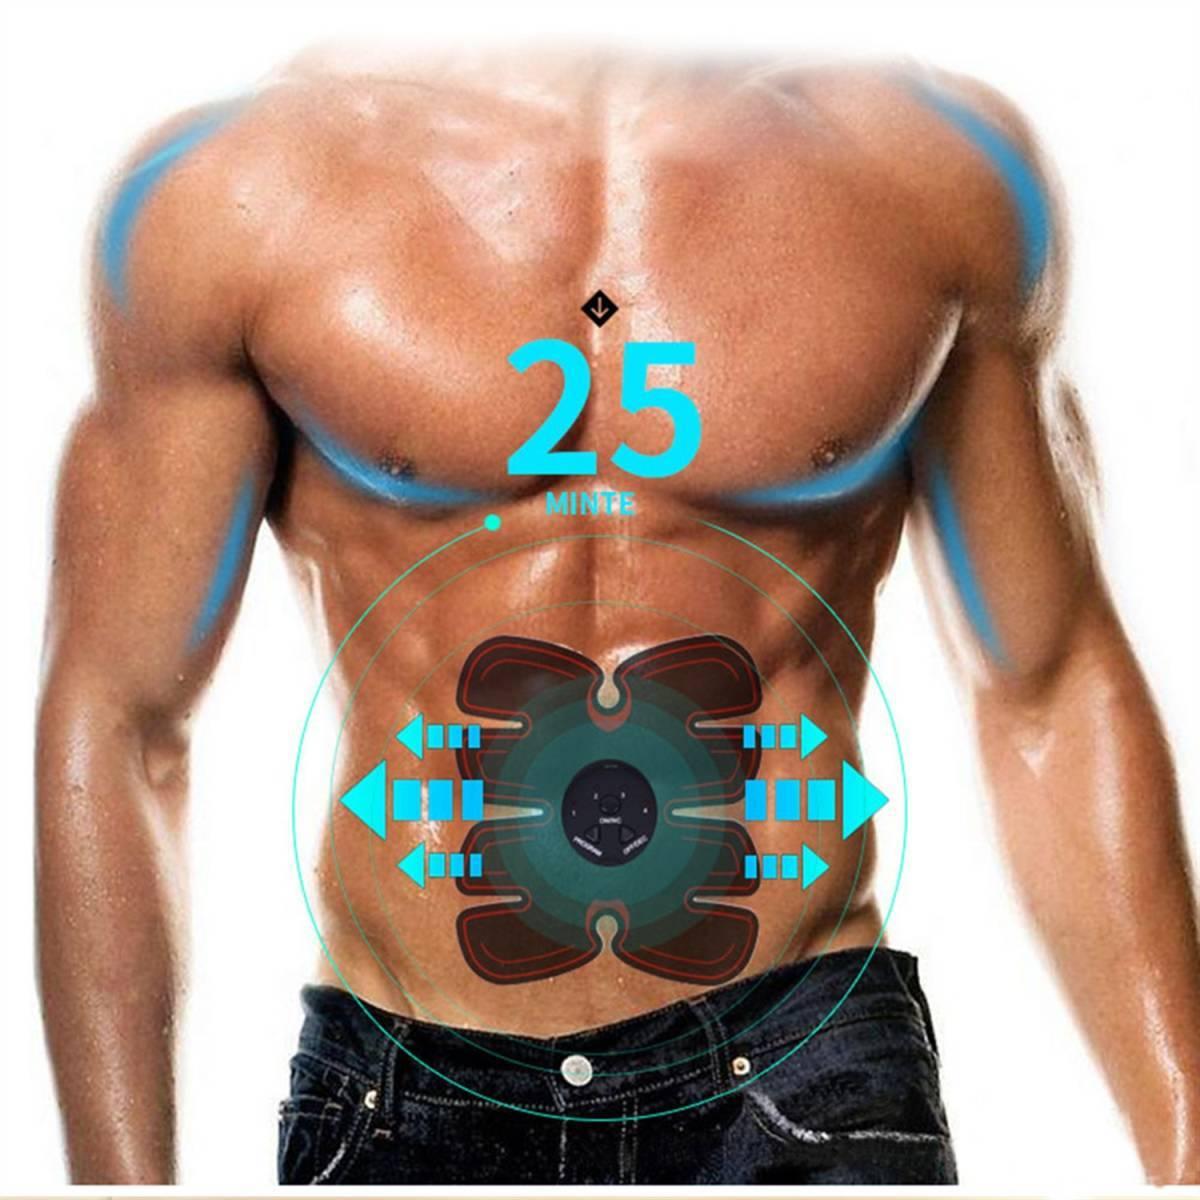 EMS 腹筋ベルト 腹筋マシーン 腹筋パッド 太もも 腕筋 筋トレ器具 ダイエット USB充電式 マッサージ エクササイズ 男女兼用_画像5